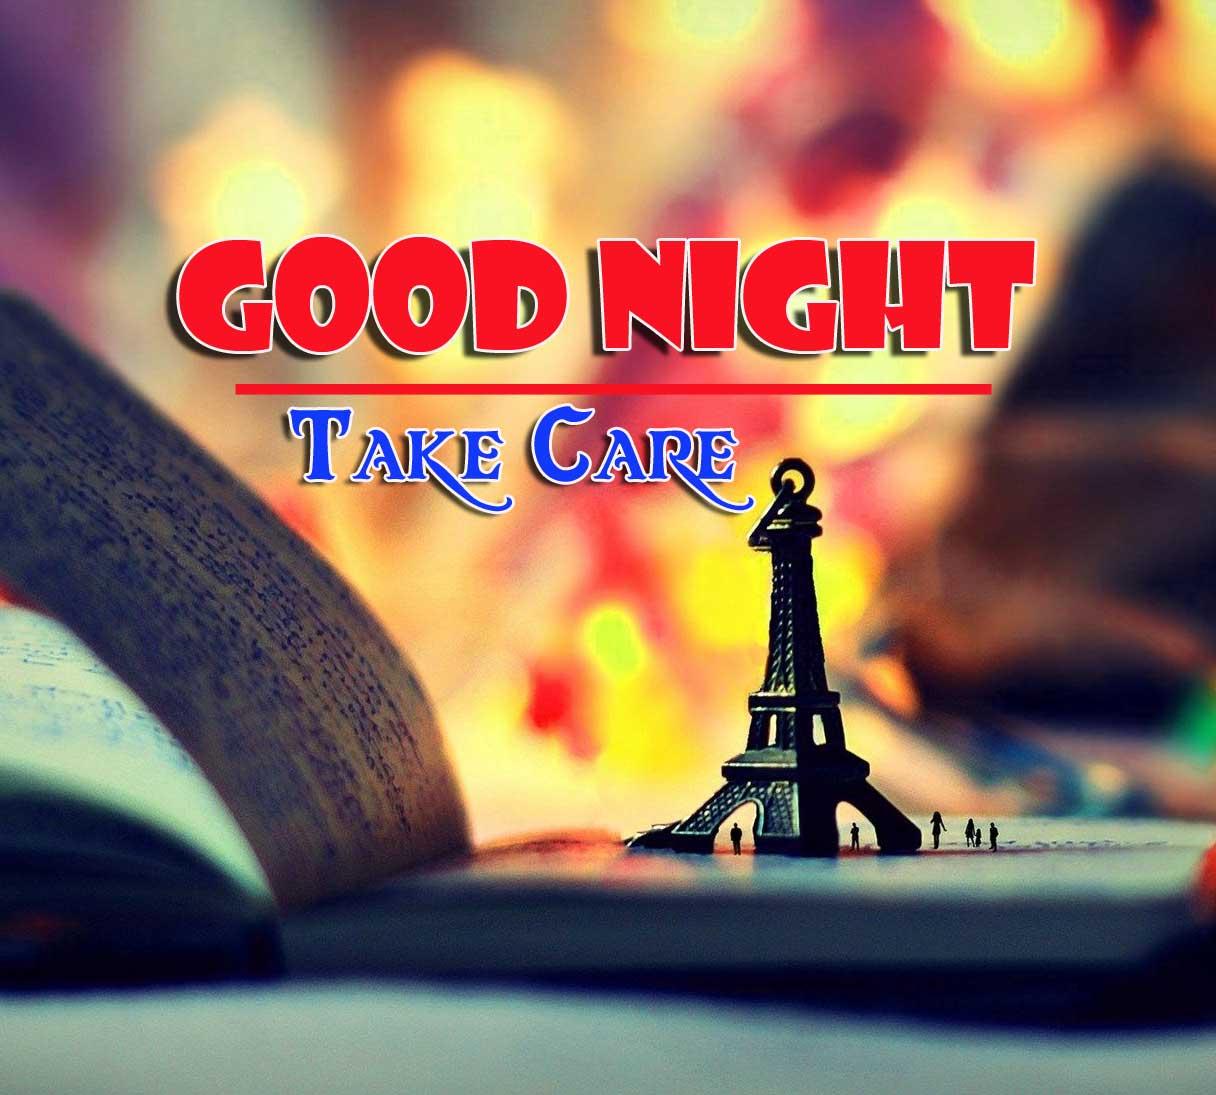 Beautiful Free Good Night Images 4k 1080p Pics HD Download